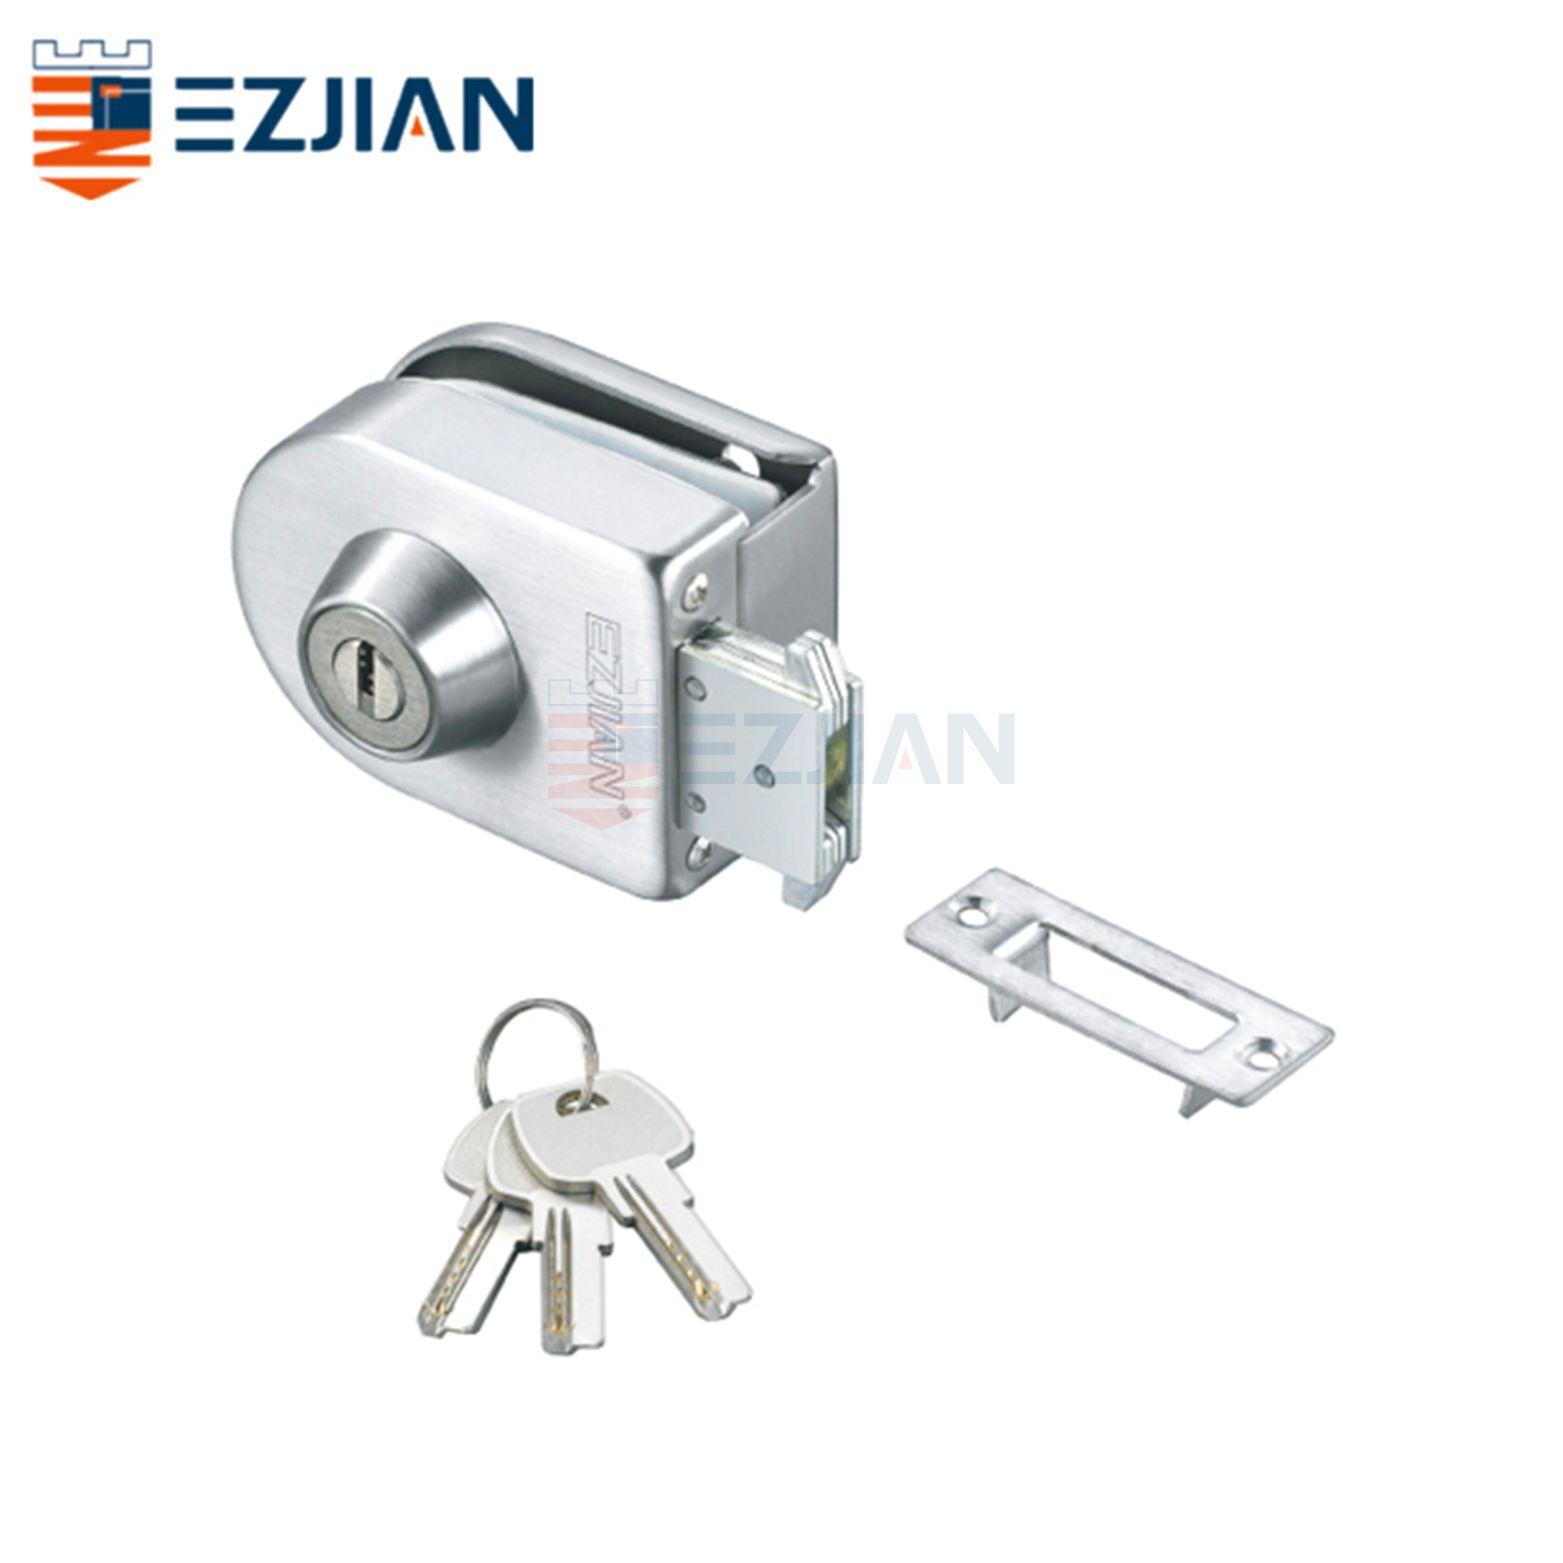 Glass Gate Lock EJ-9015